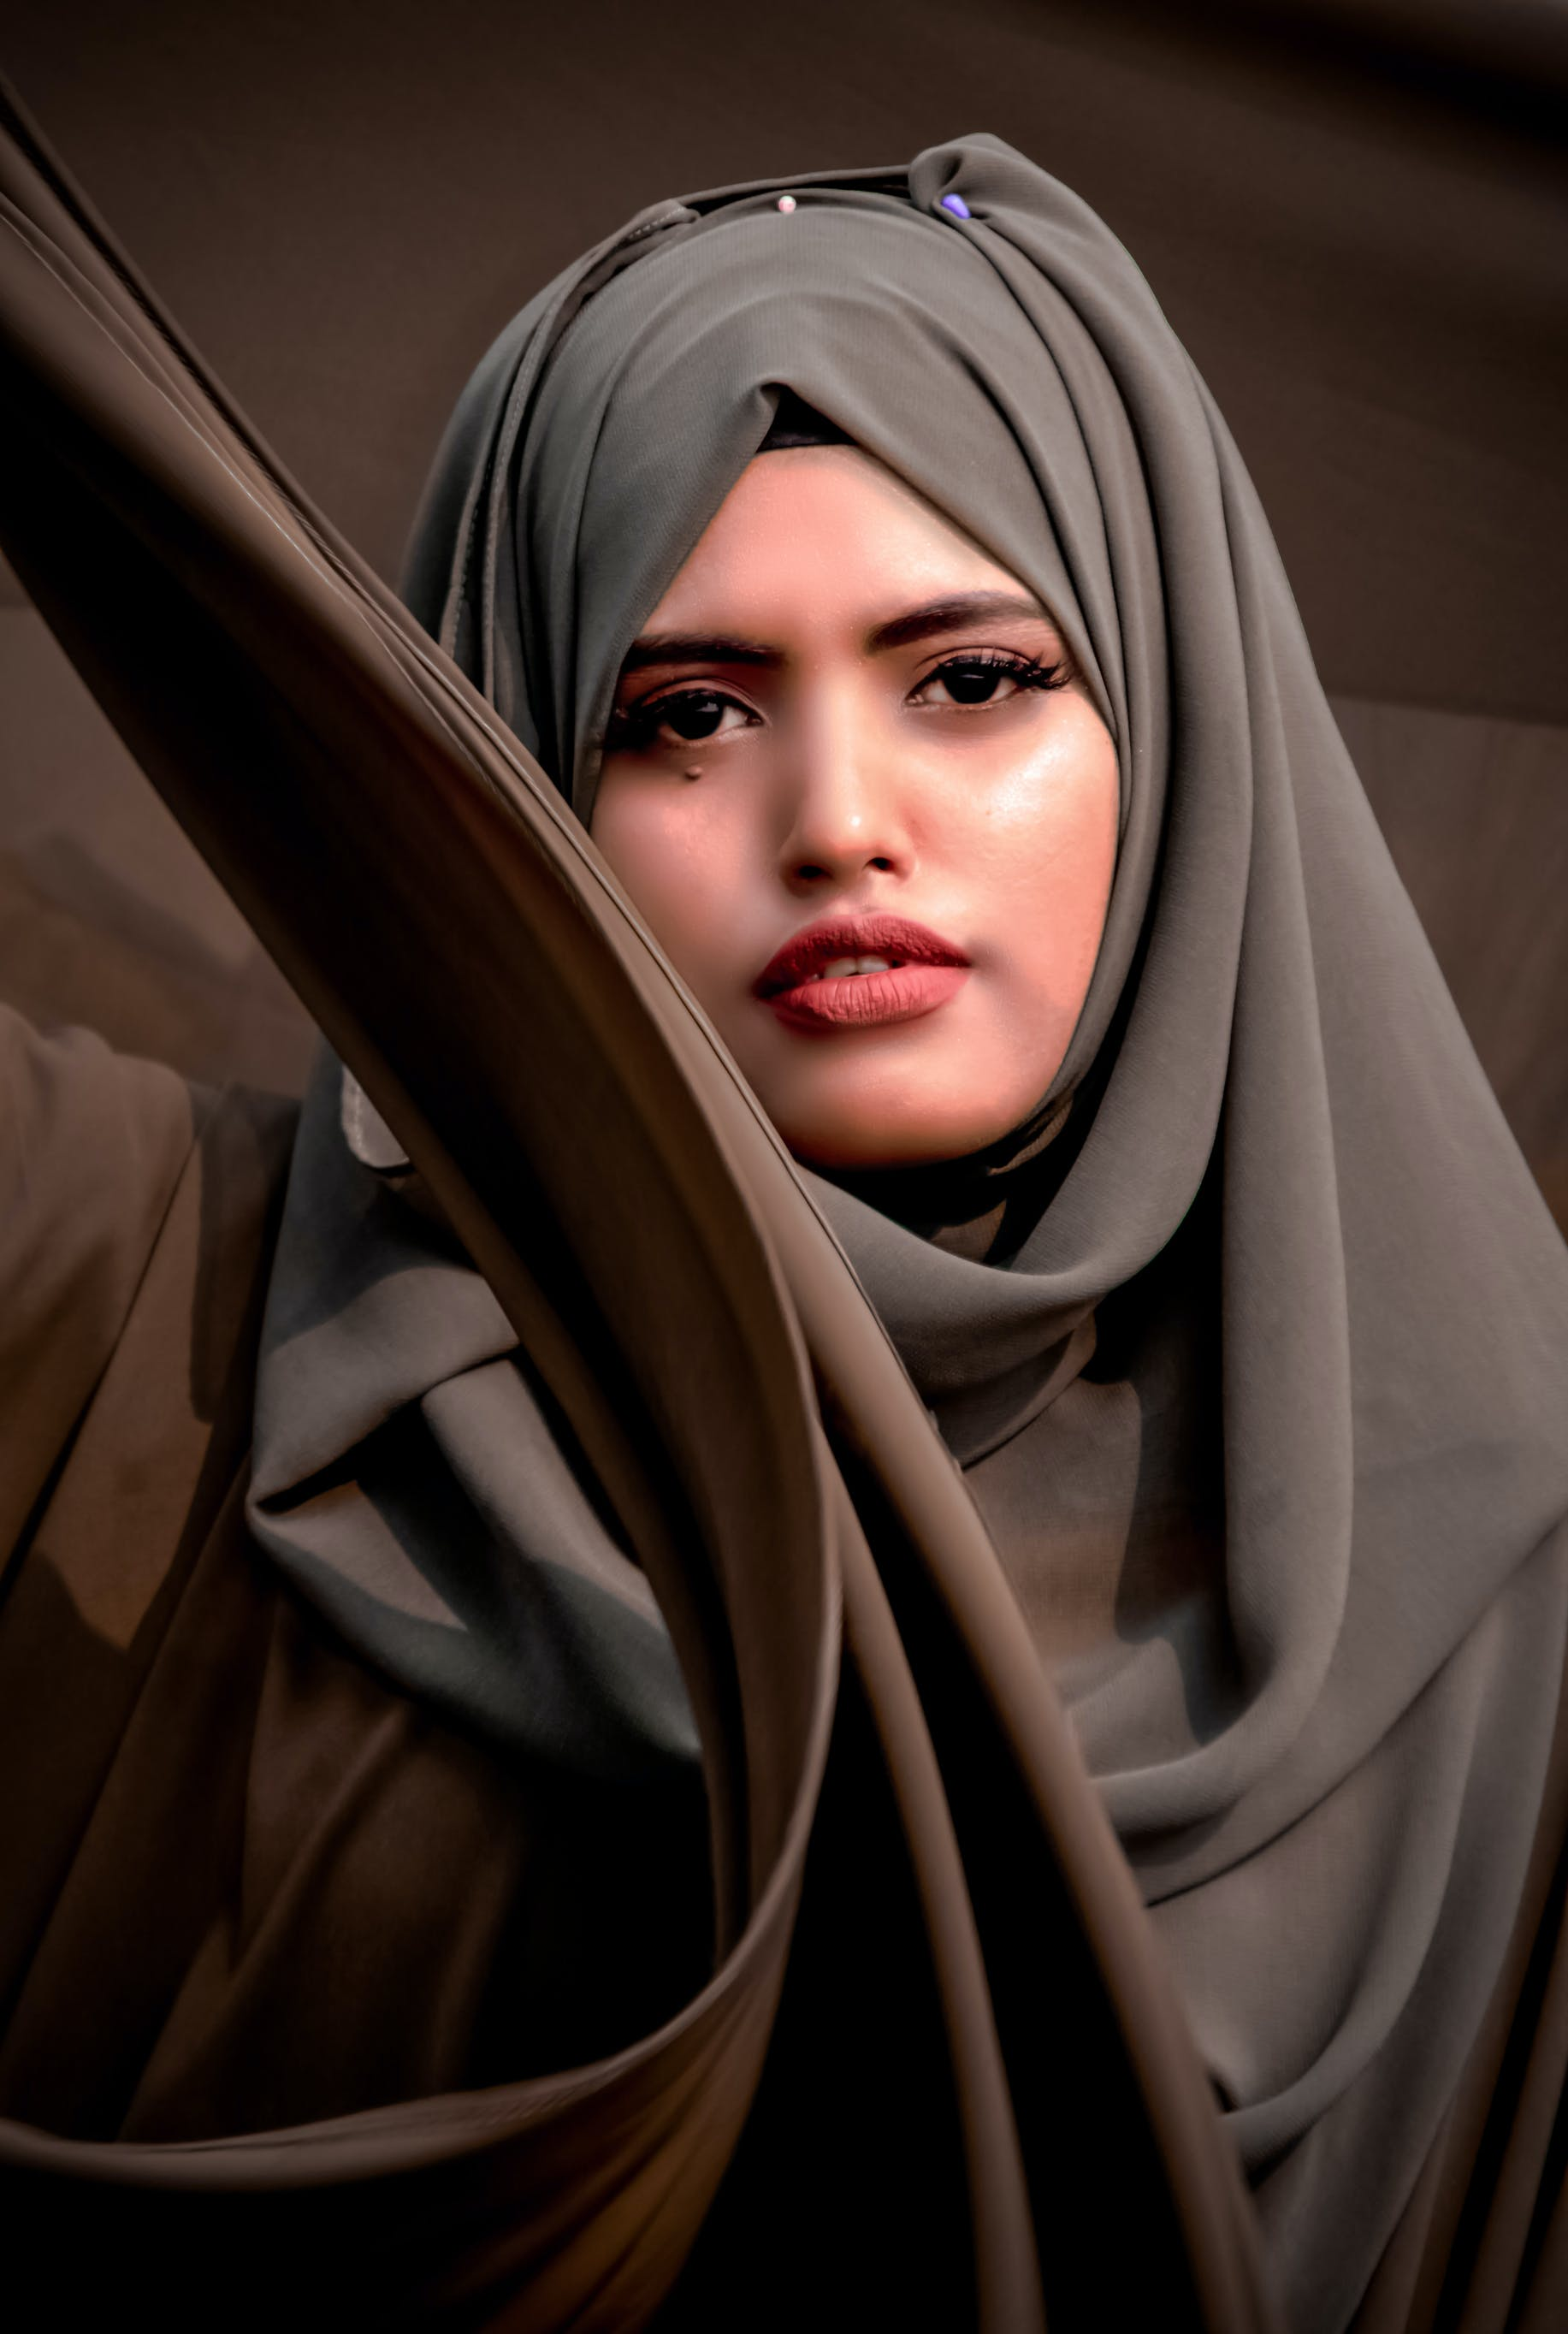 Free stock photo of bangladeshi, bangladeshi photographer, beautiful woman, cloth